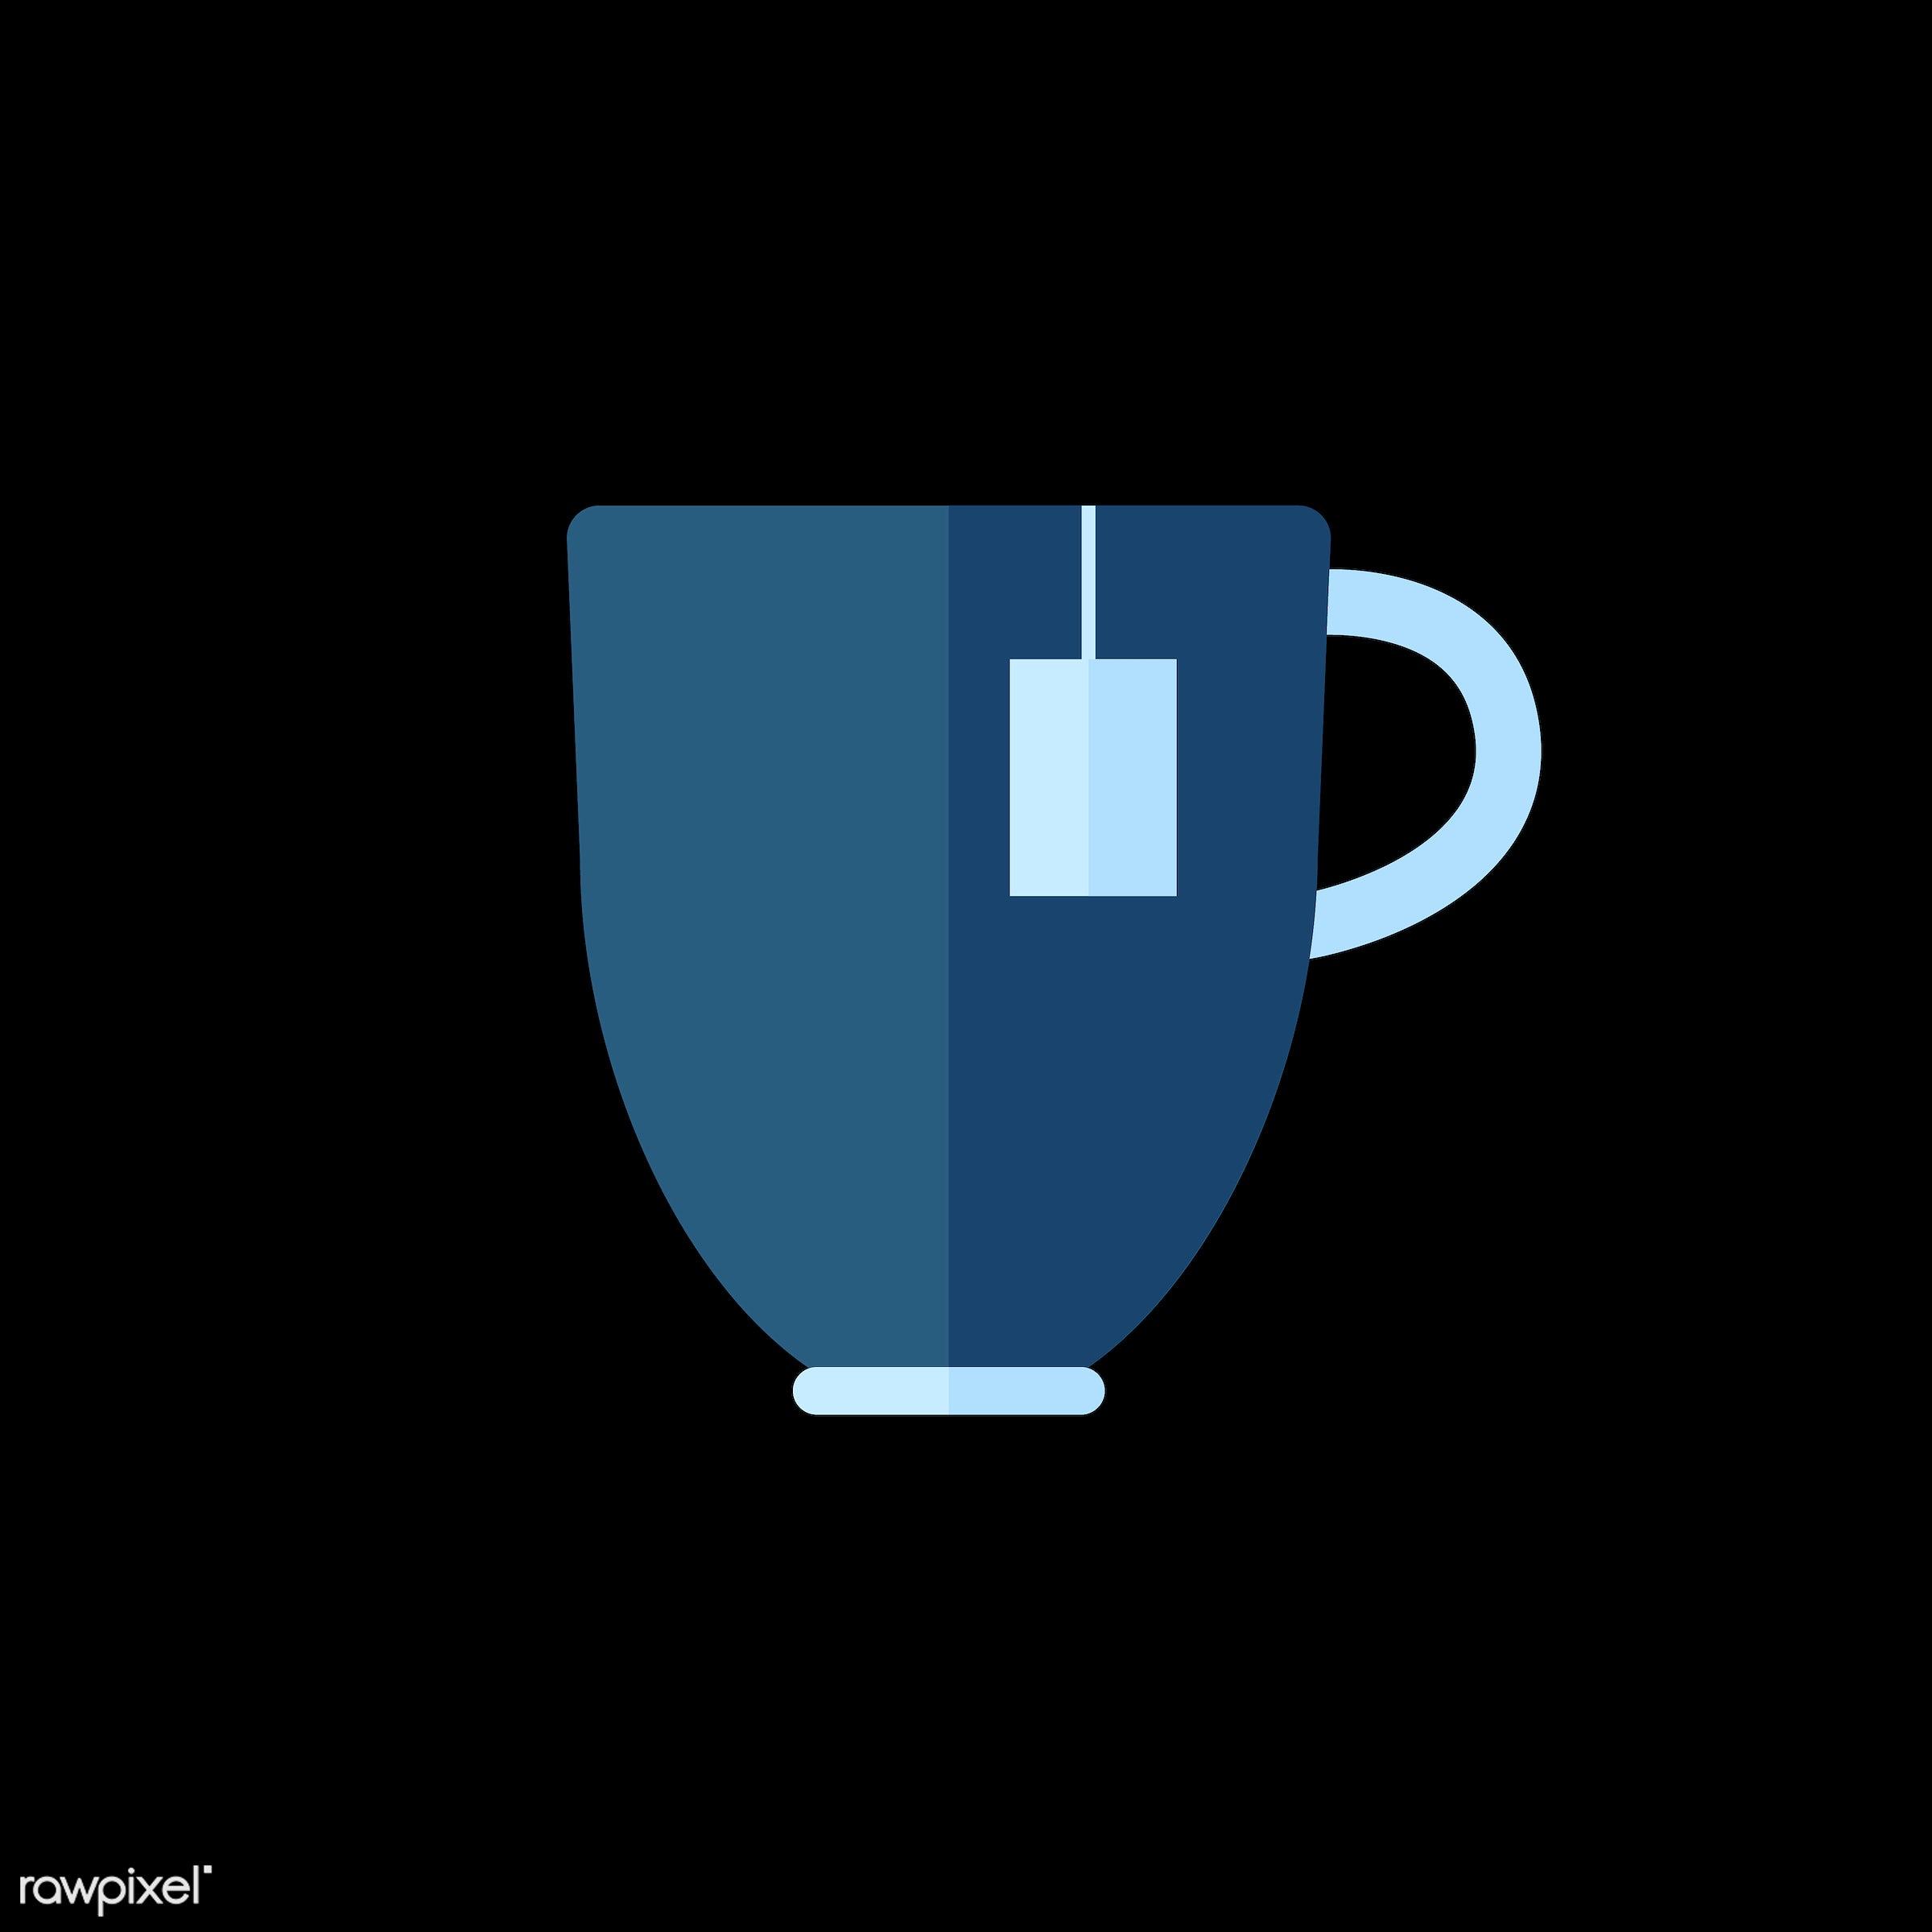 vector, graphic, illustration, icon, symbol, colorful, cute, drink, beverage, water, blue, tea, tea mug, tea bag, tea cup